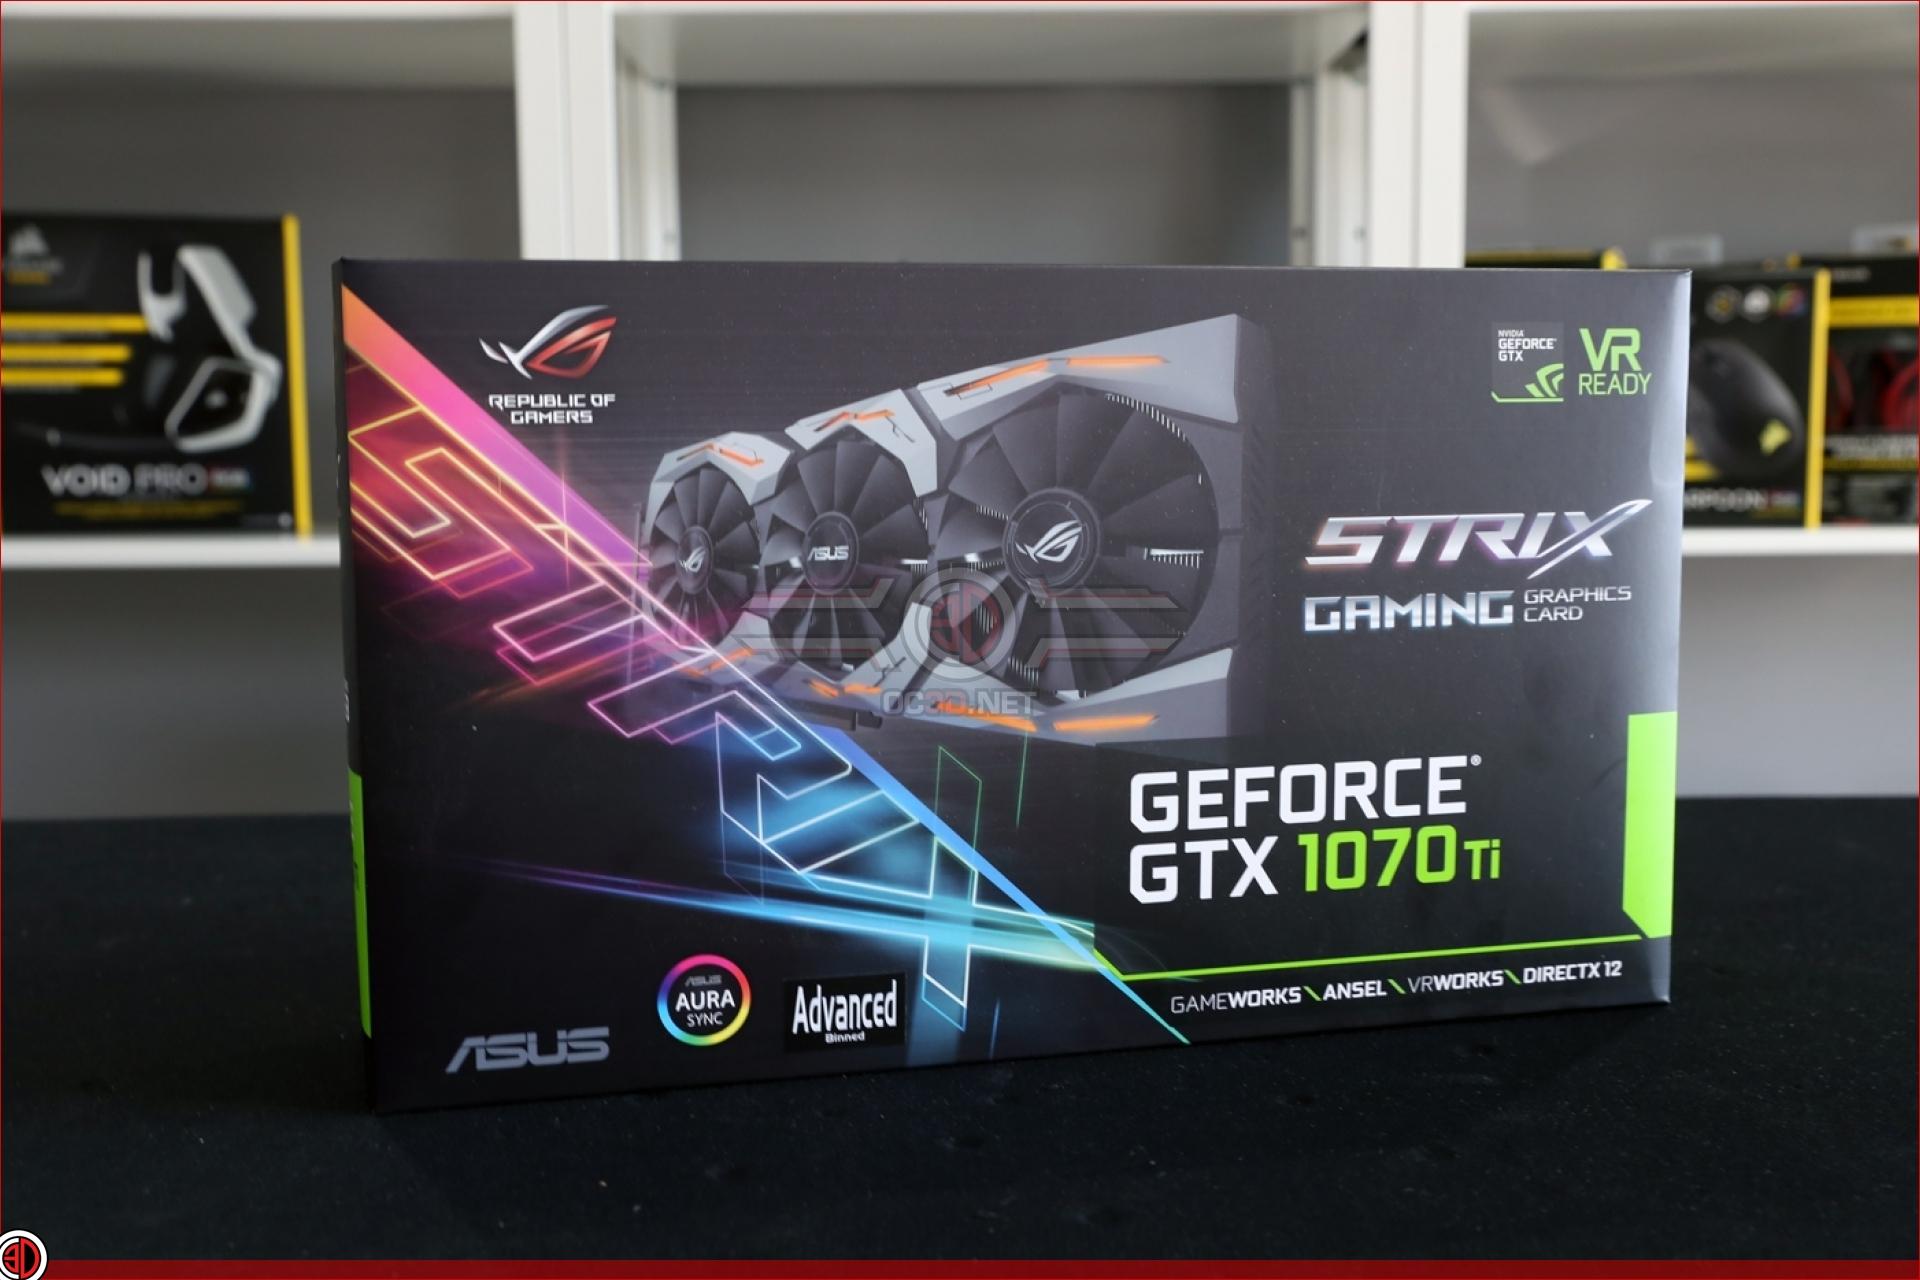 ASUS Strix GTX 1070 Ti Preview | Up Close | GPU & Displays | OC3D Review